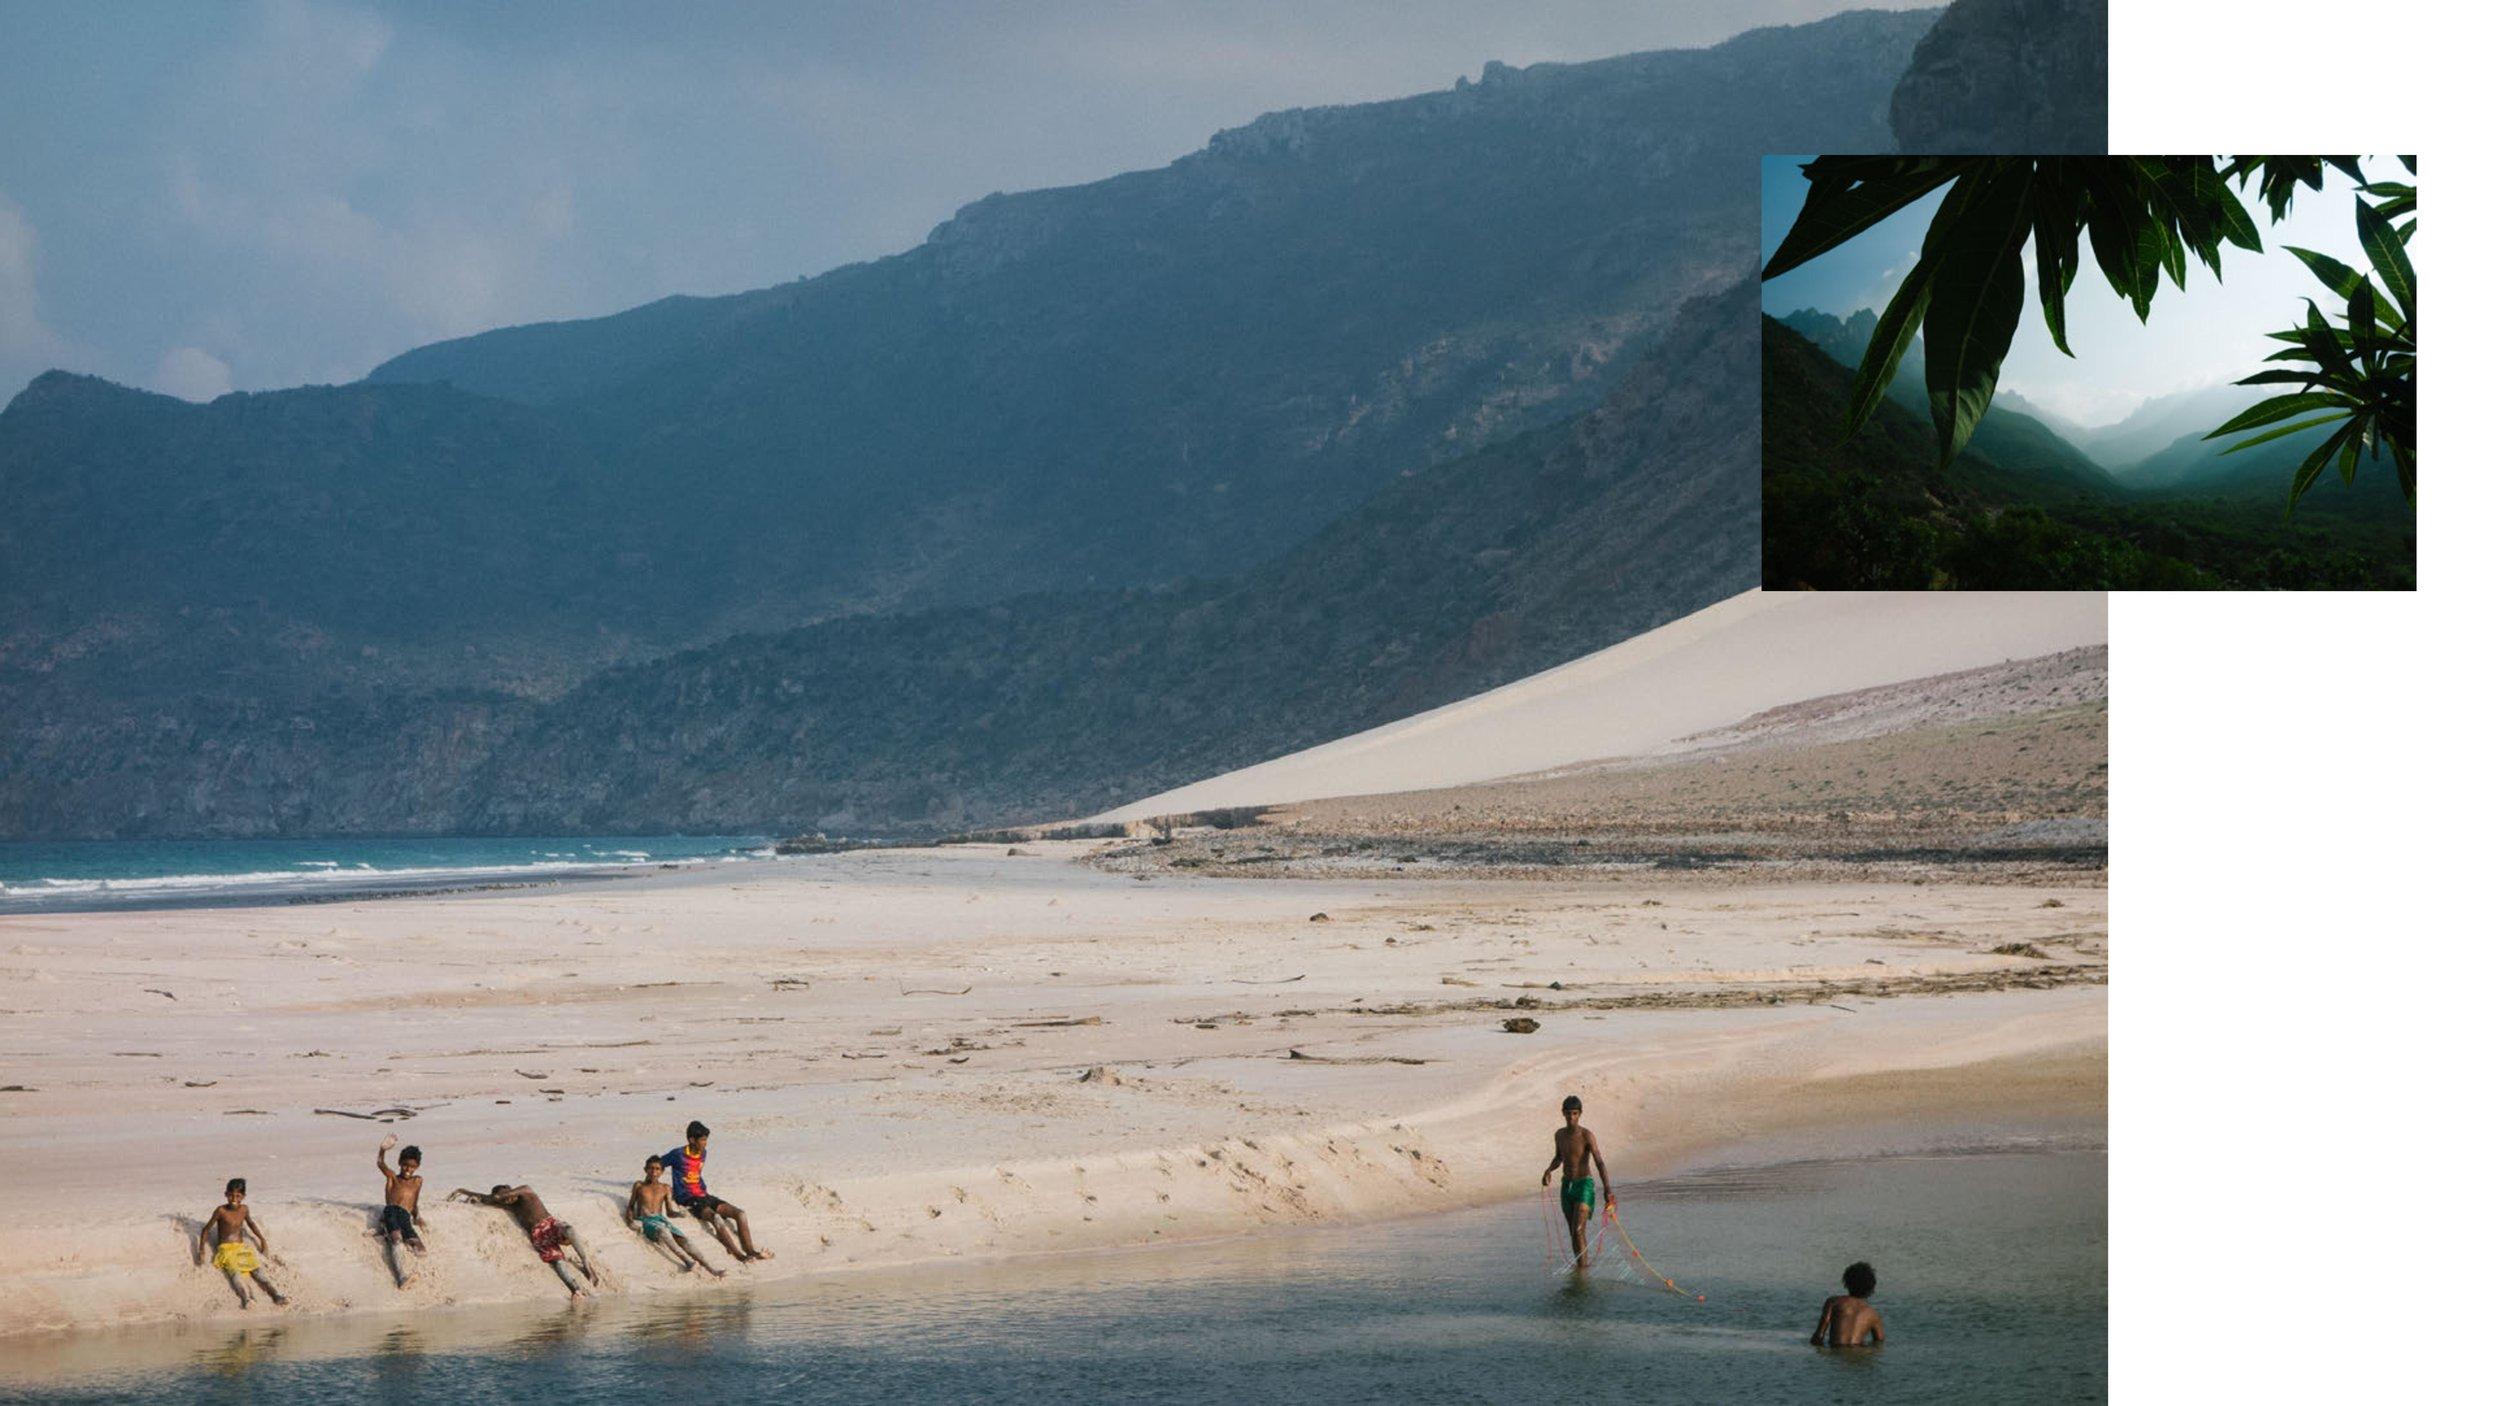 Images of Socotra, Yemen by Yumna Al Arashi. Courtesy of the artist.